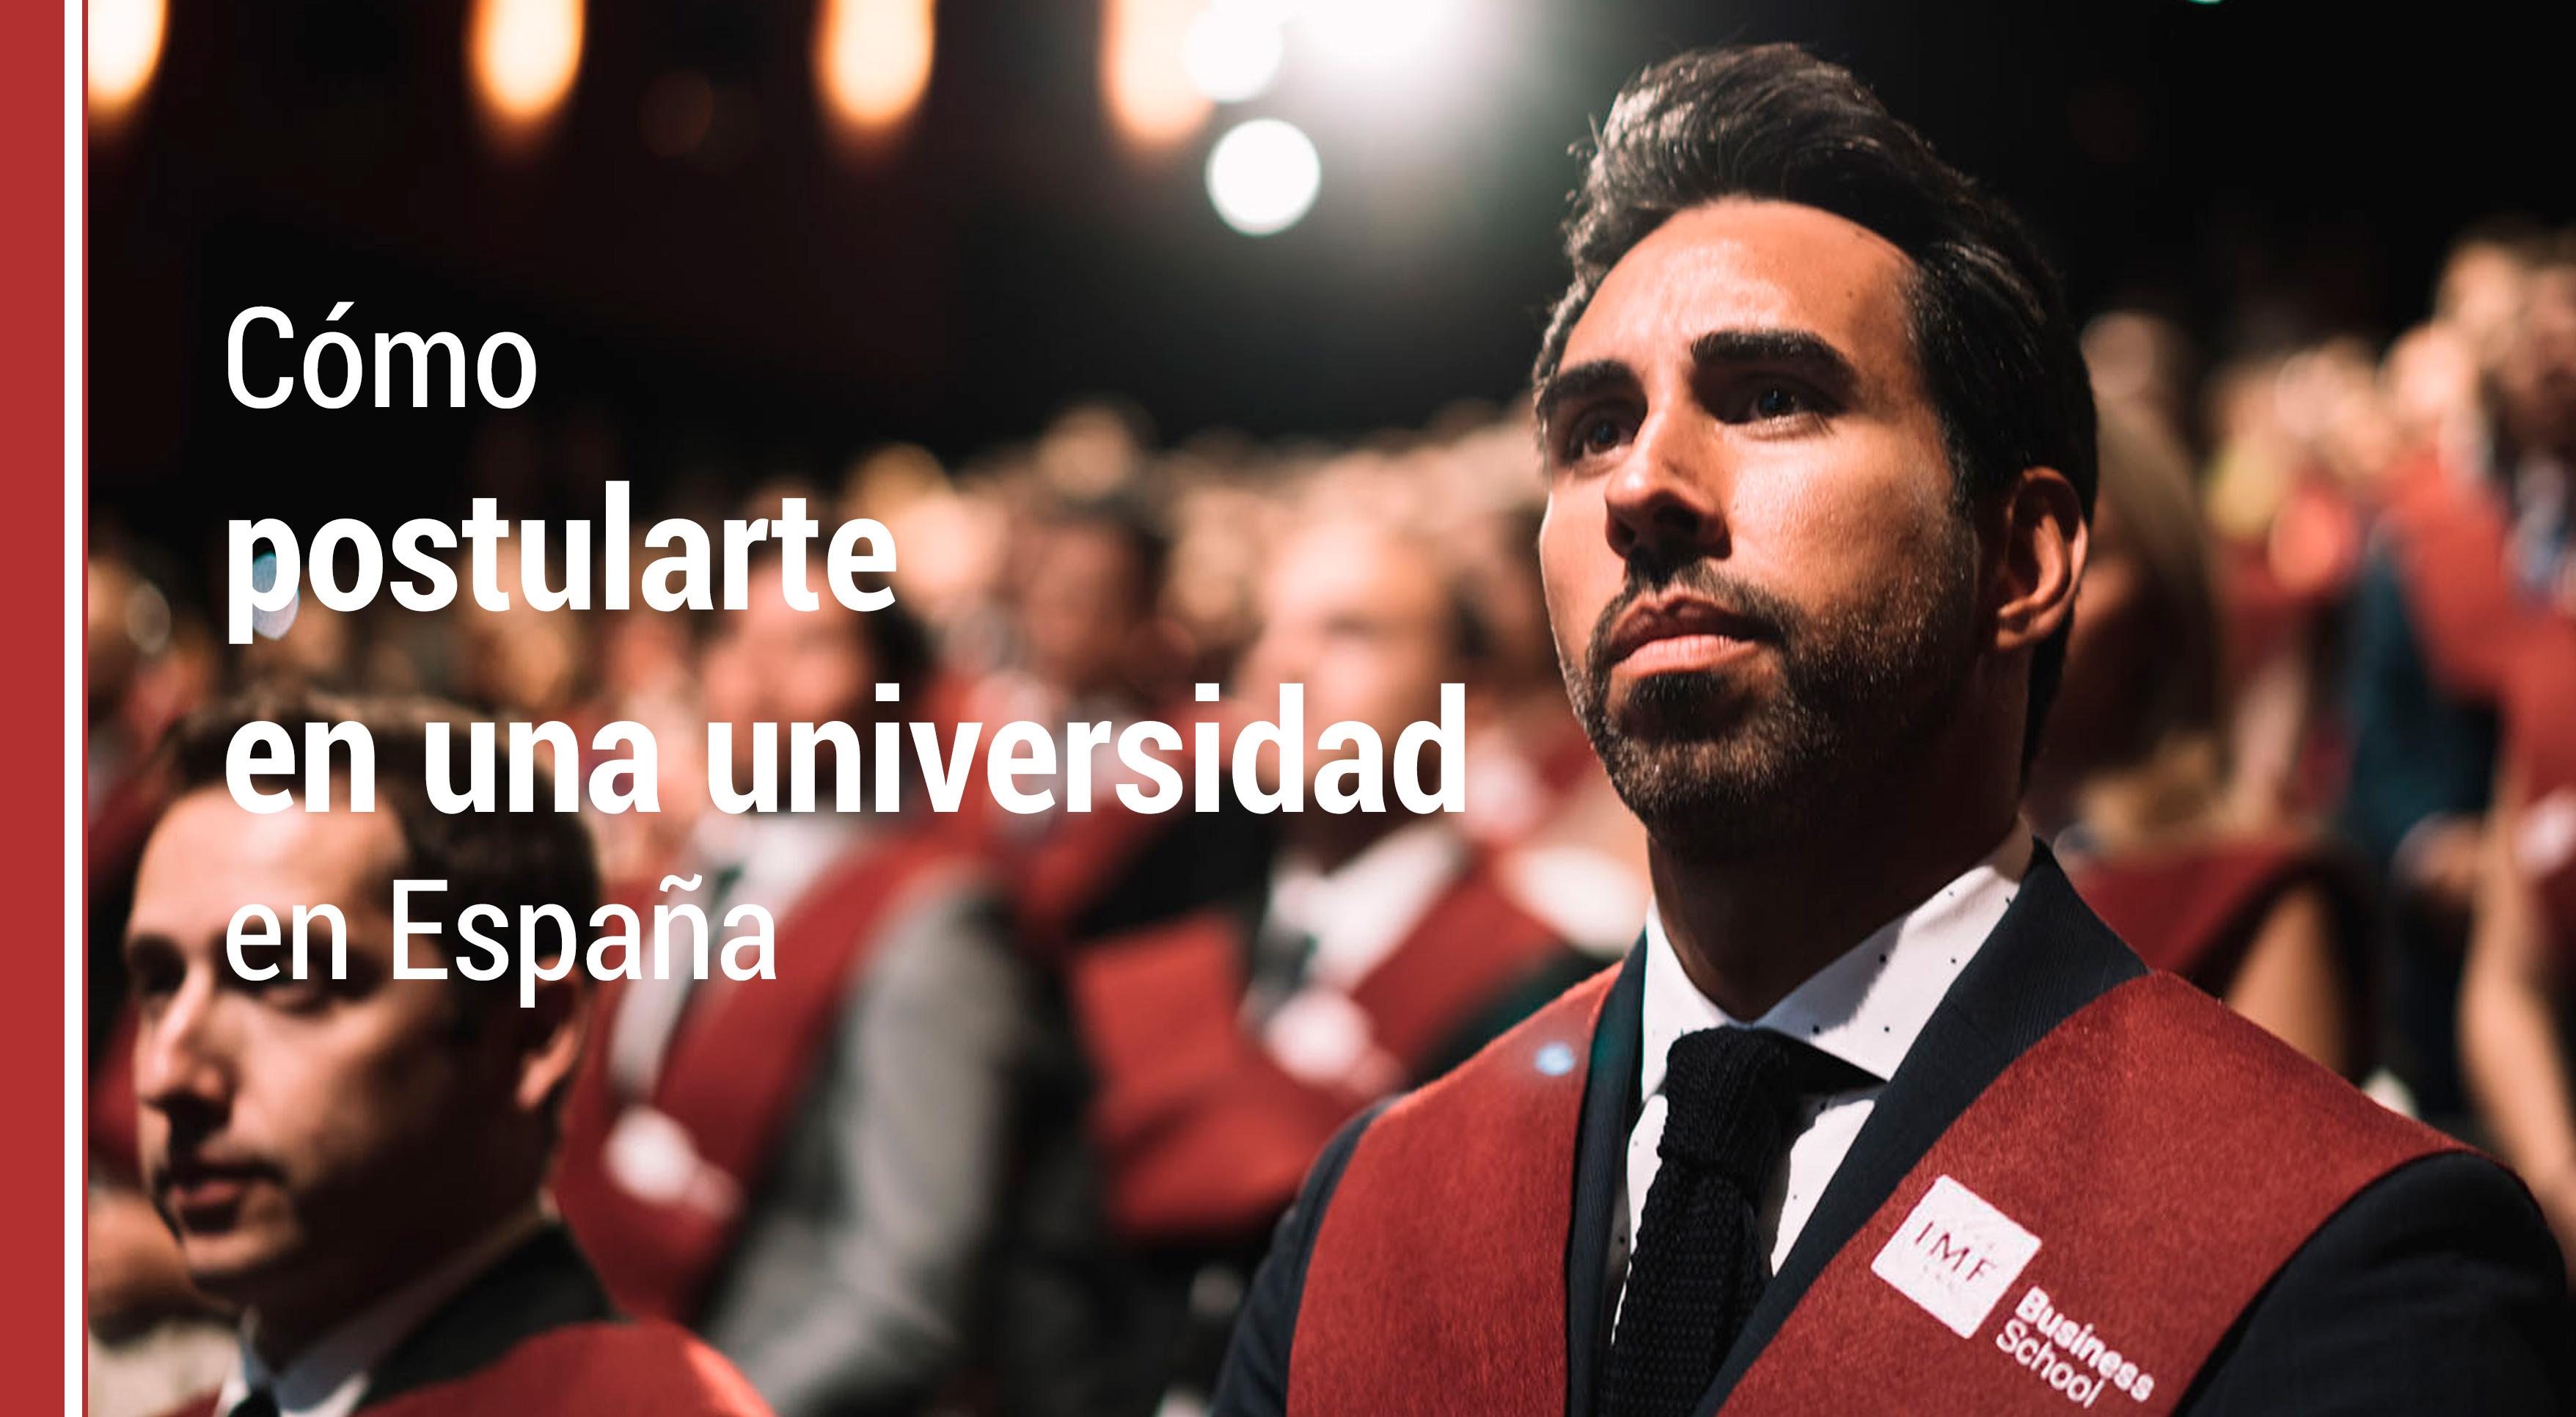 como-postularte-universidad-espana Estudiar en España: Cómo postularte en una universidad